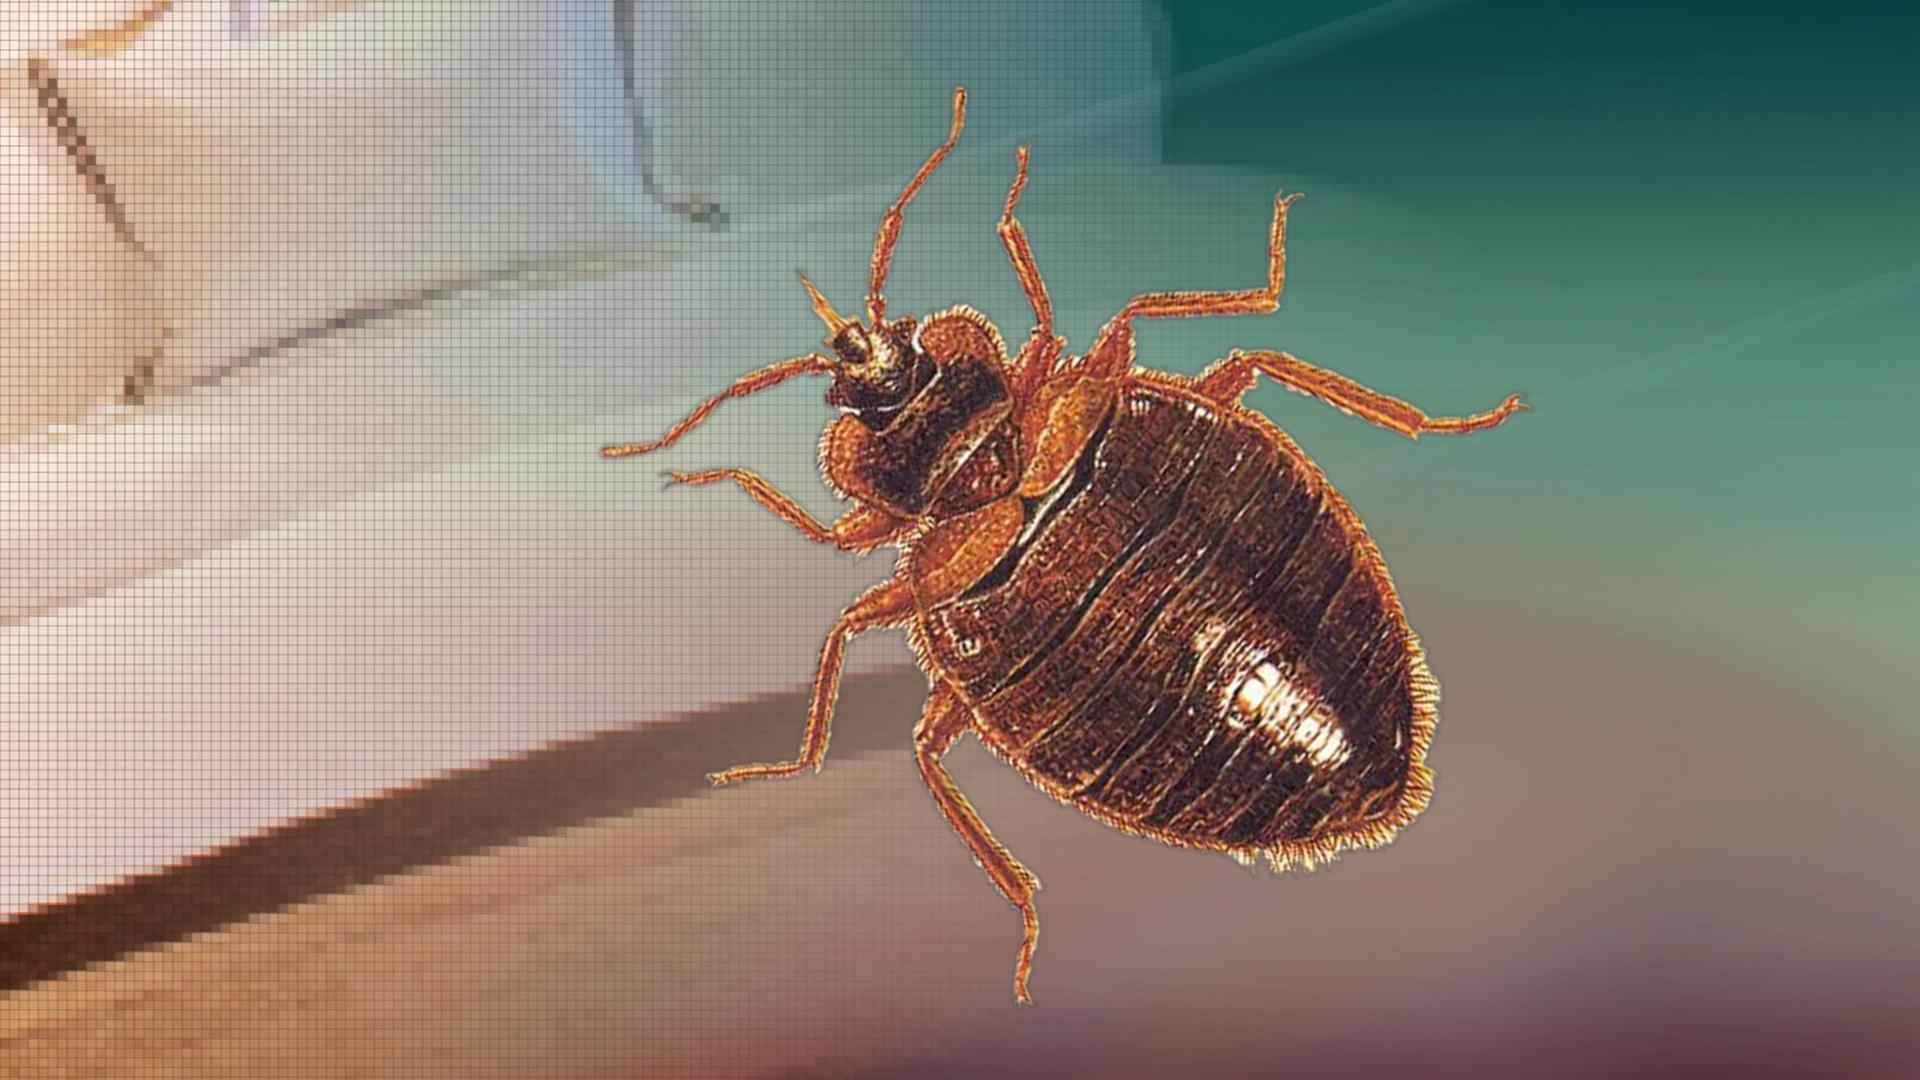 New york oneida county oriskany falls - Bed Bugs Found And Treated At Metlife In Oriskany